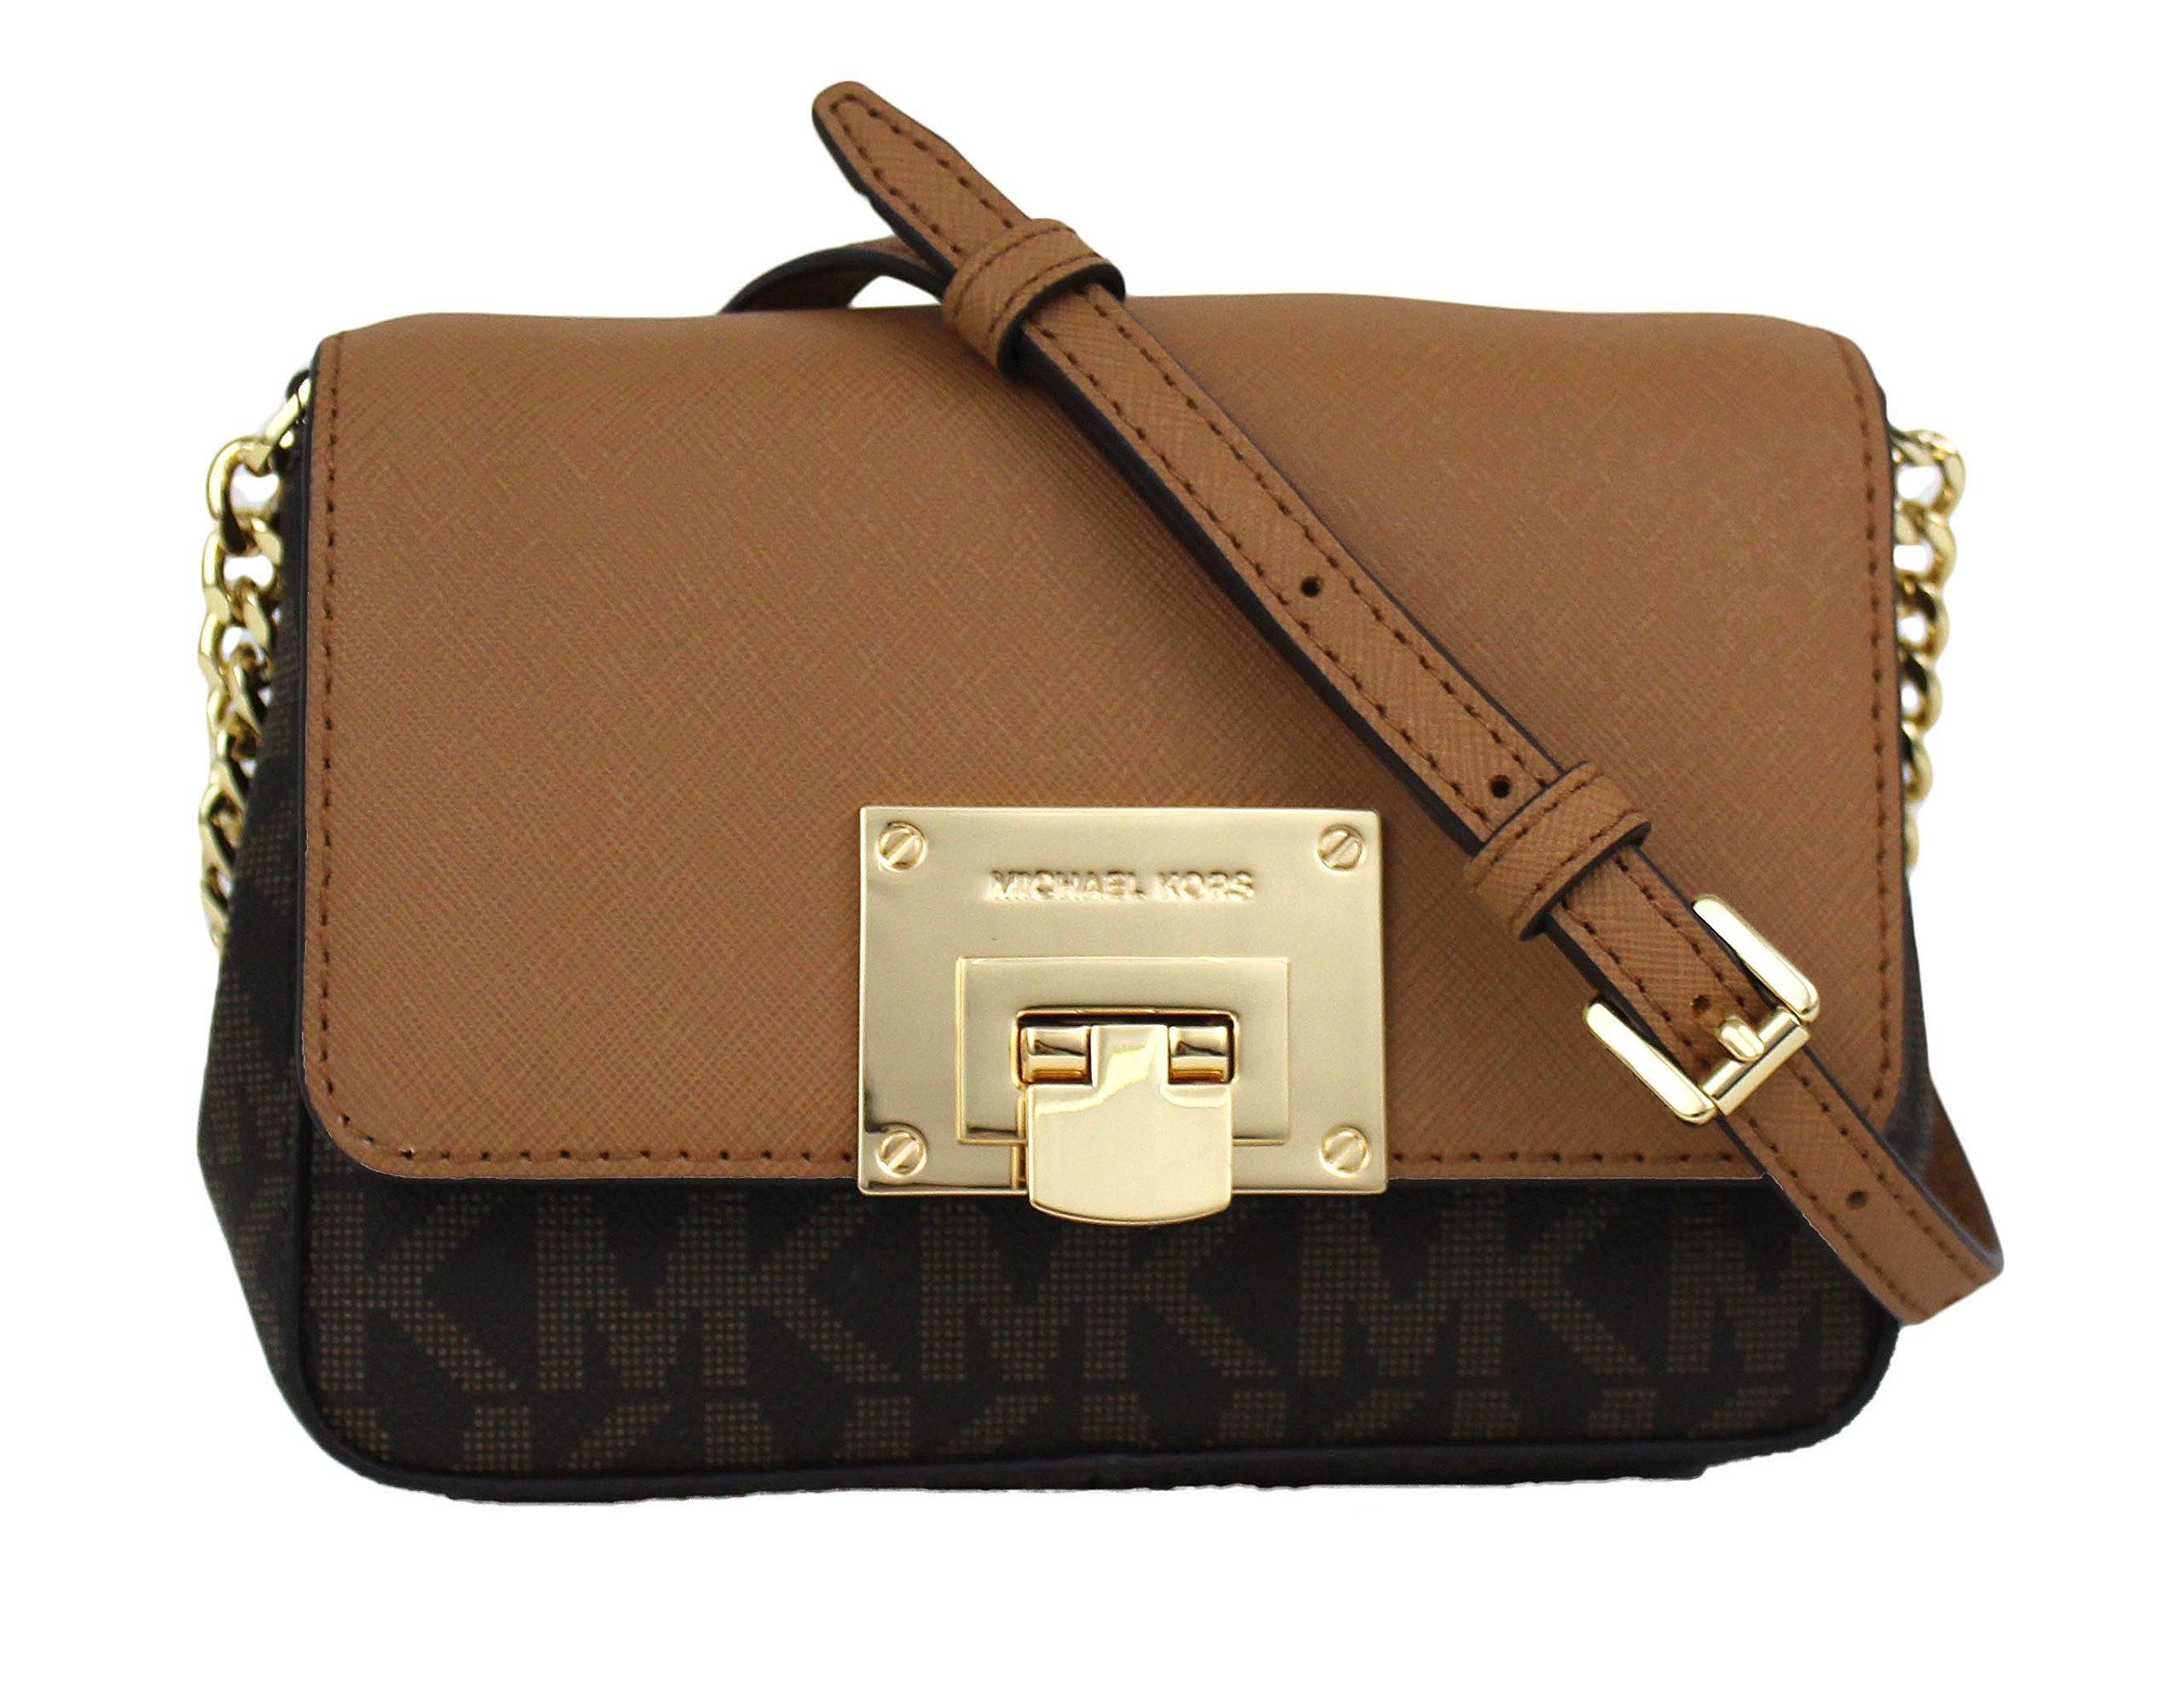 Michael Kors Tina Small Leather Clutch, Crossbody Shoulder Bag